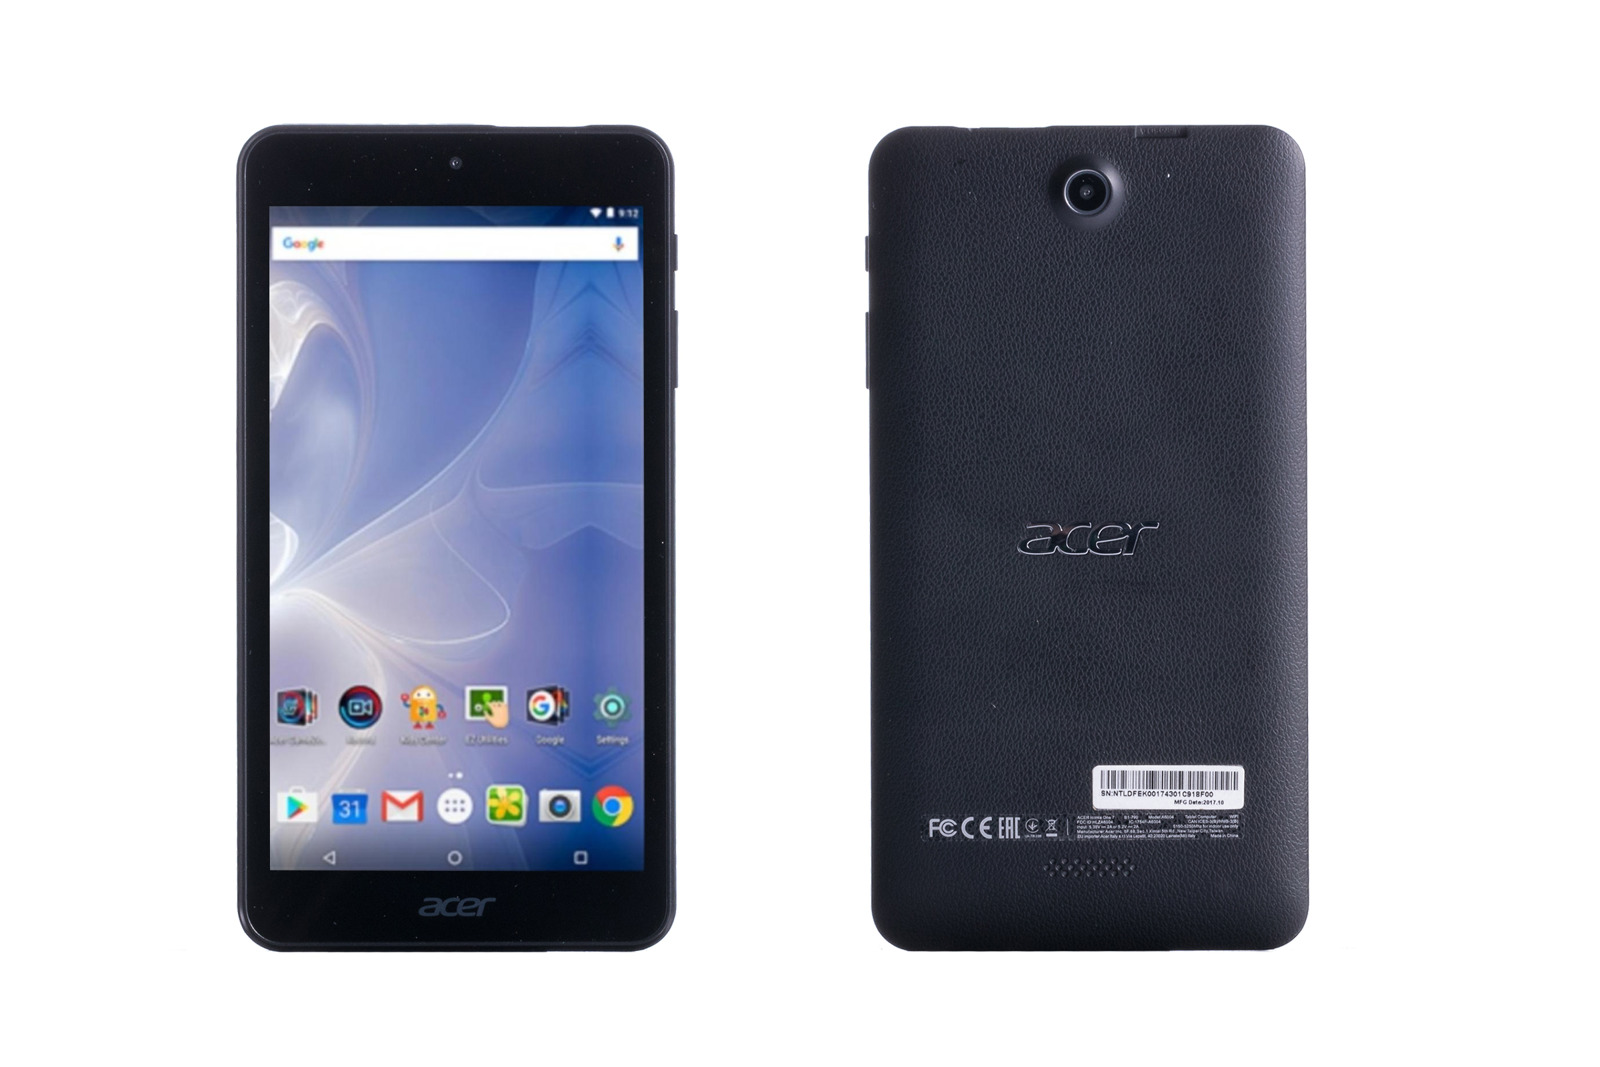 Tablet Acer Iconia One 7 16GB Wi-Fi Black B1-790 Grade B